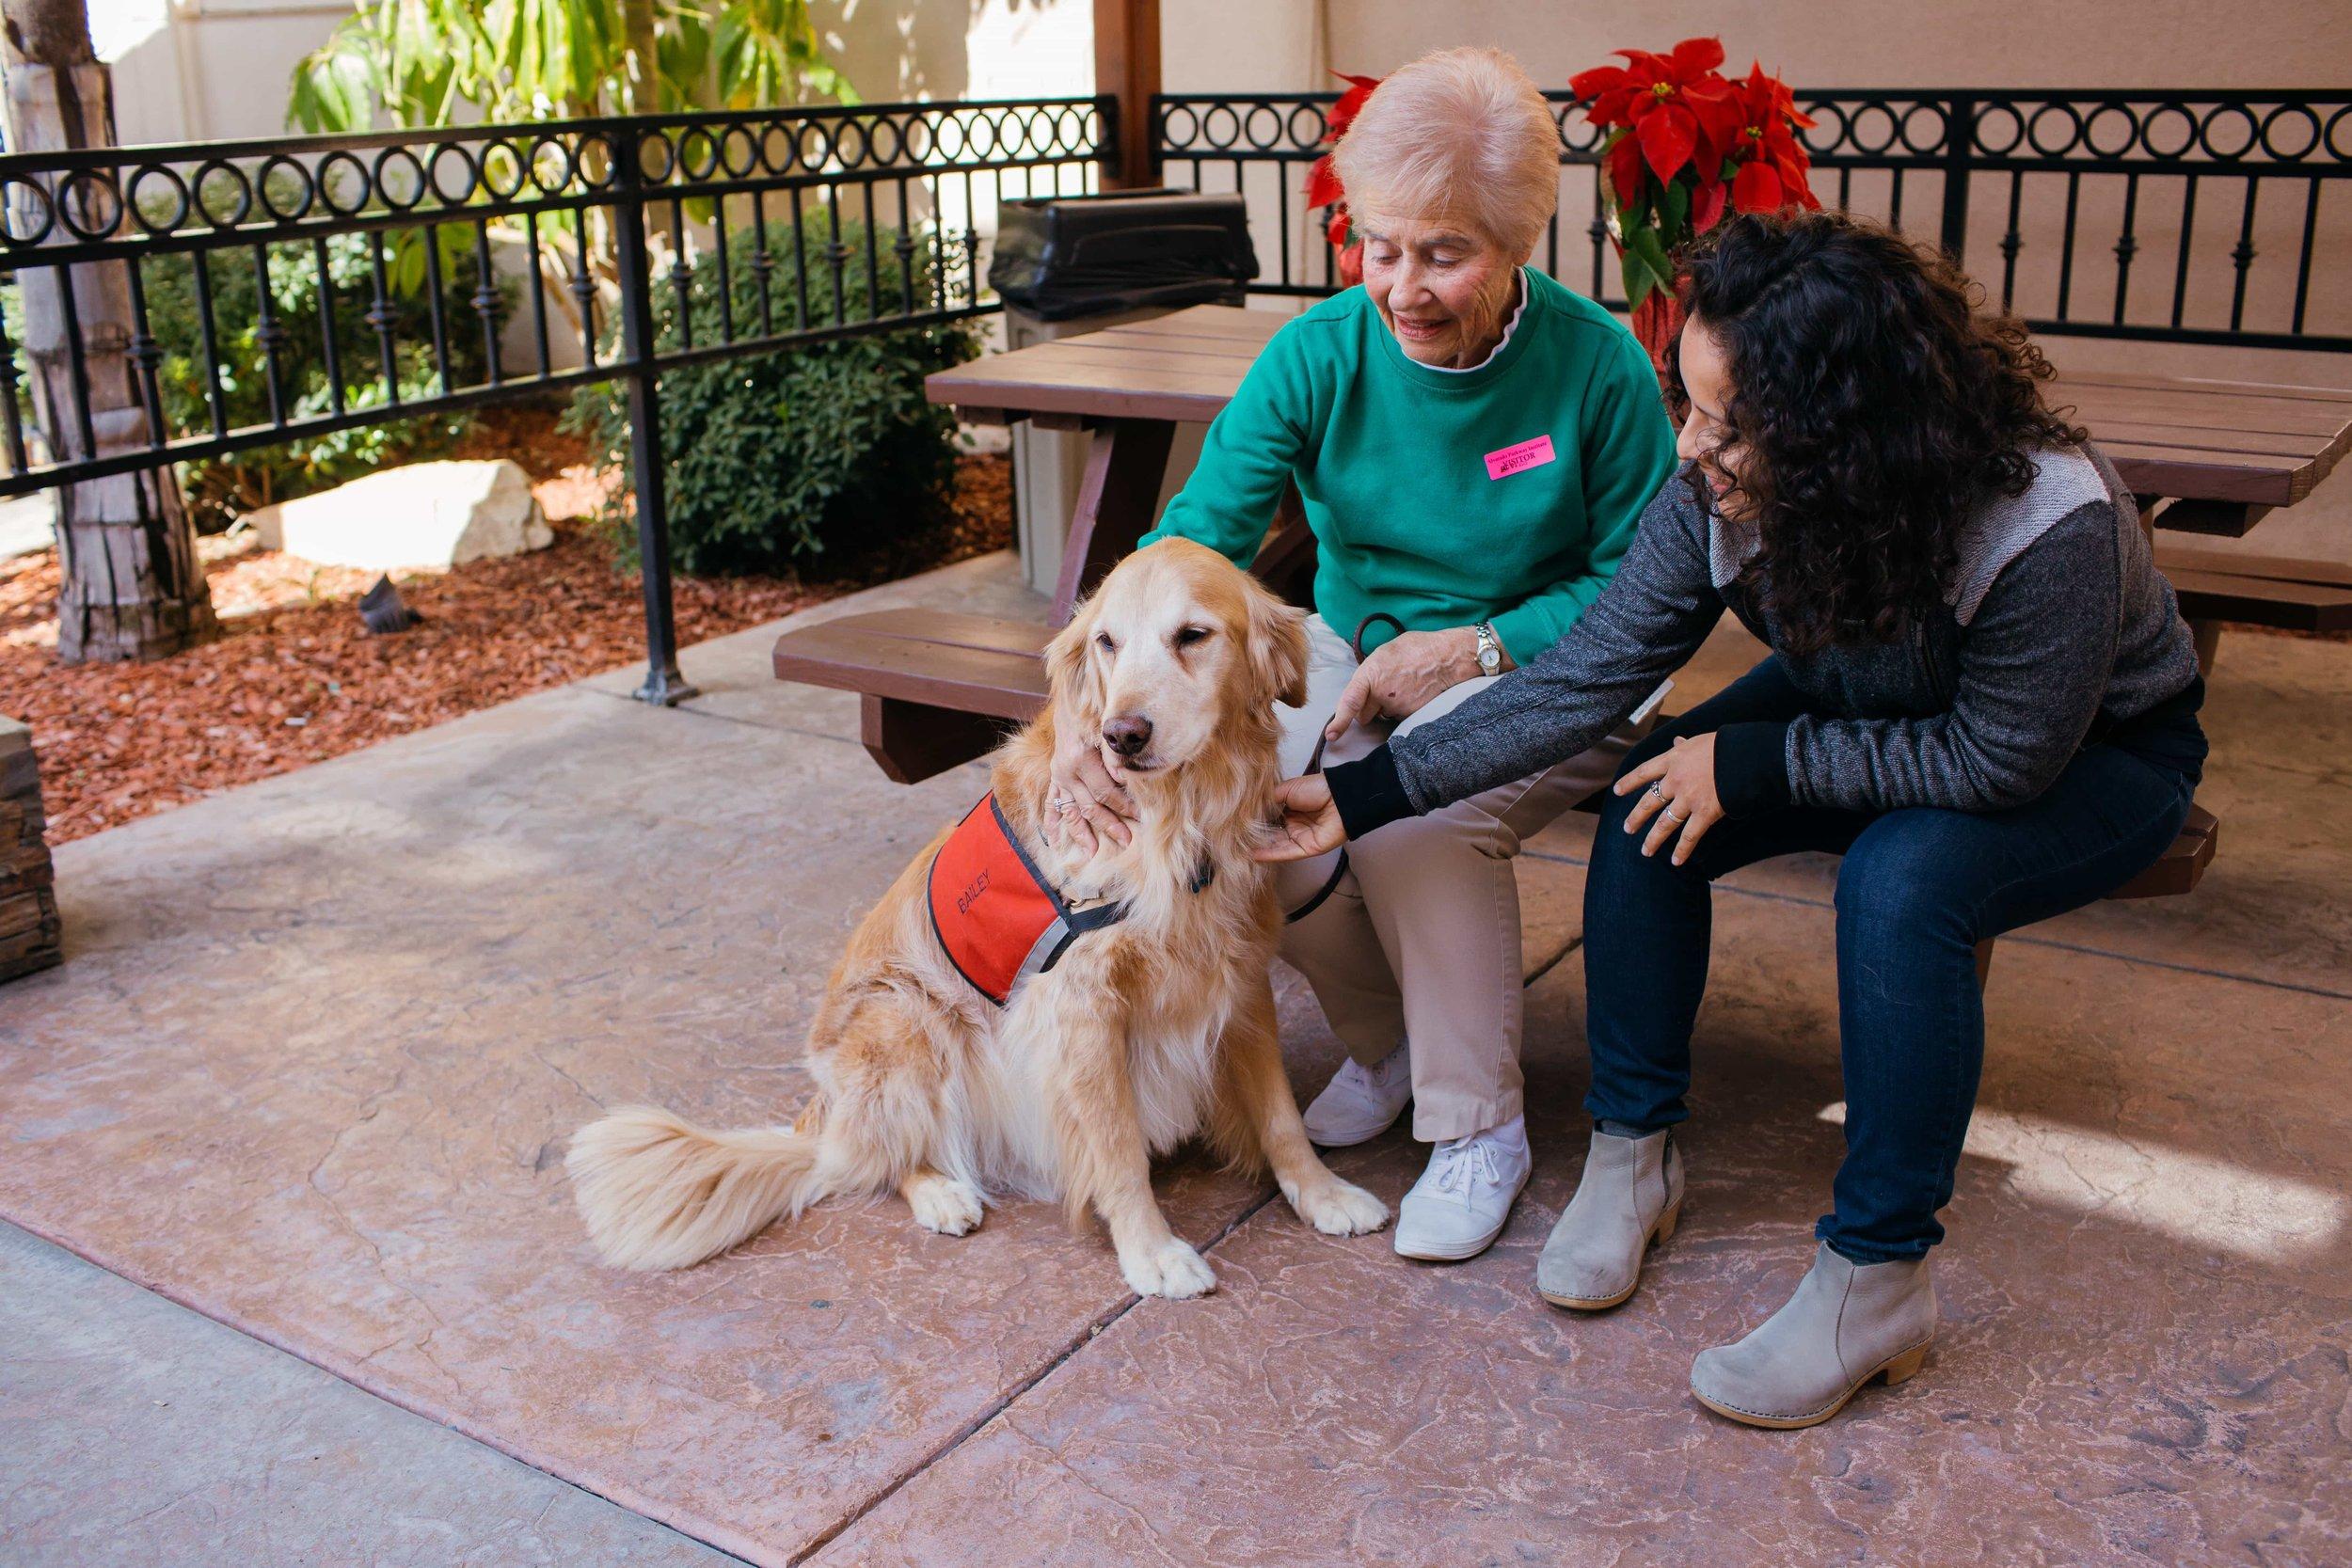 dog to help manage stress